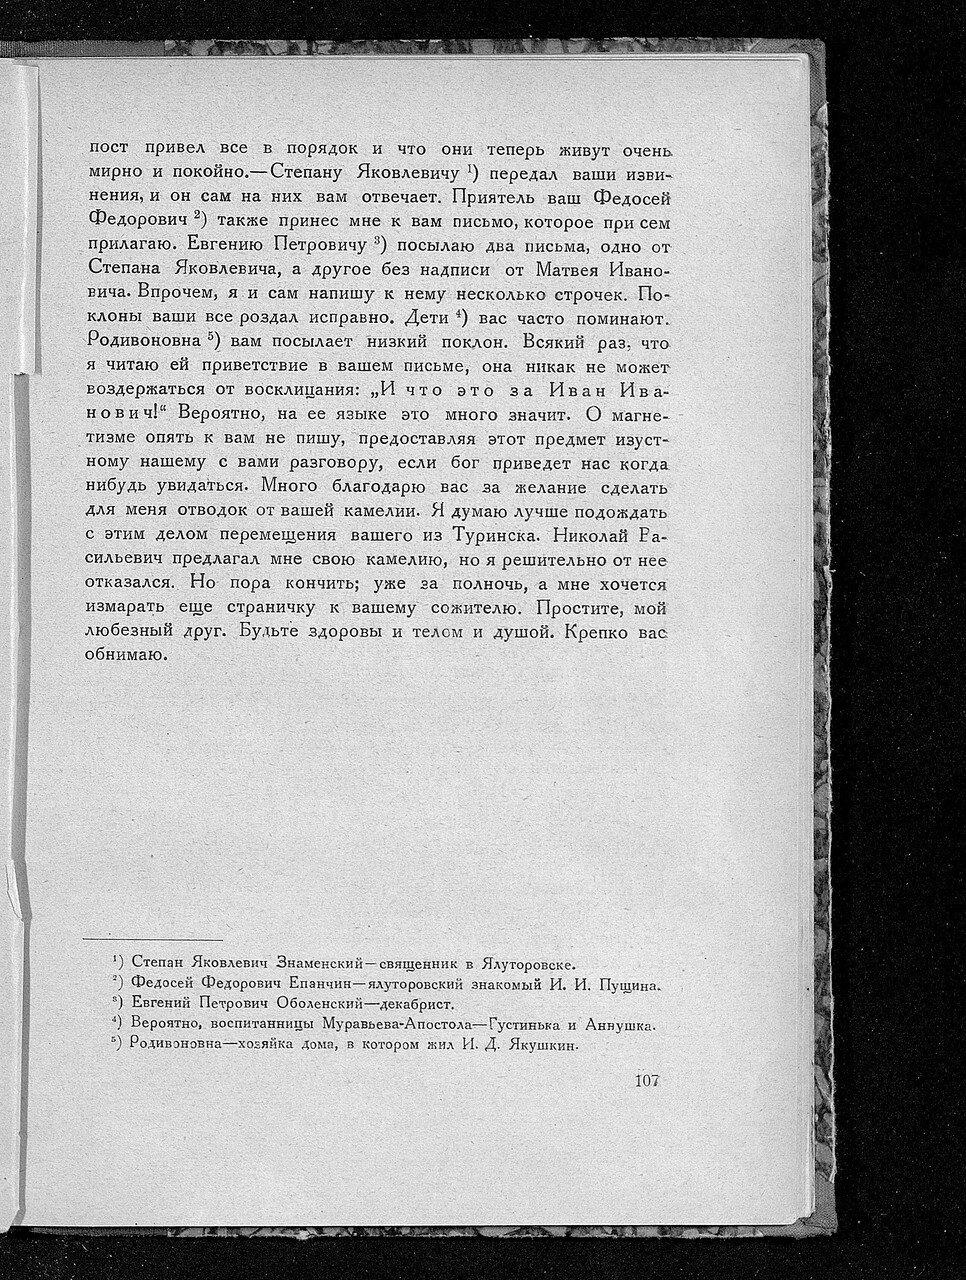 https://img-fotki.yandex.ru/get/509739/199368979.a2/0_214366_821f0f91_XXXL.jpg